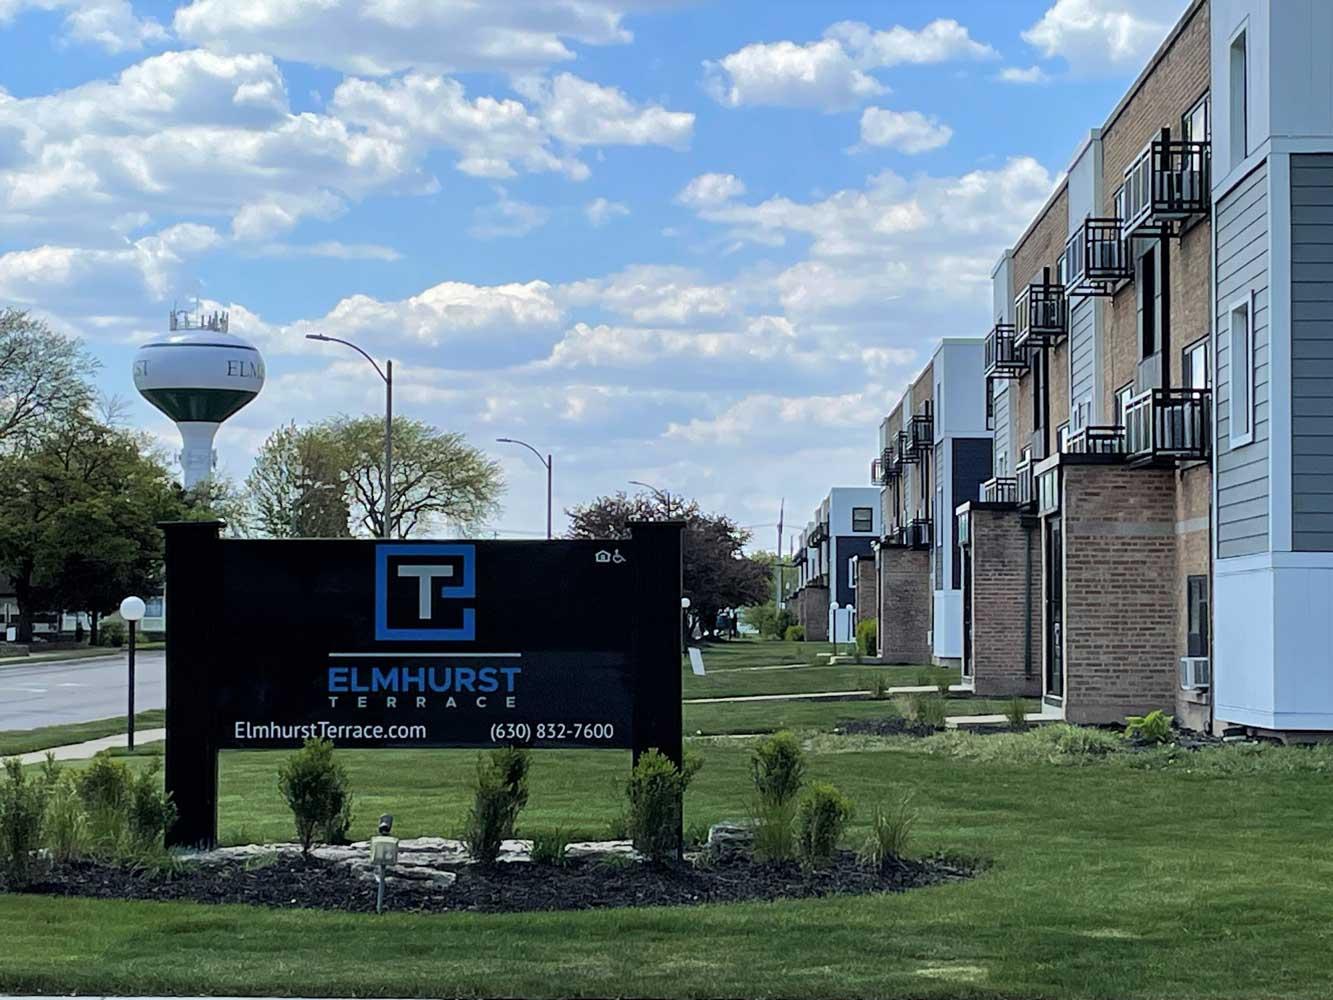 On-Site Management Available at Elmhurst Terrace Apartments in Elmhurst, Illinois